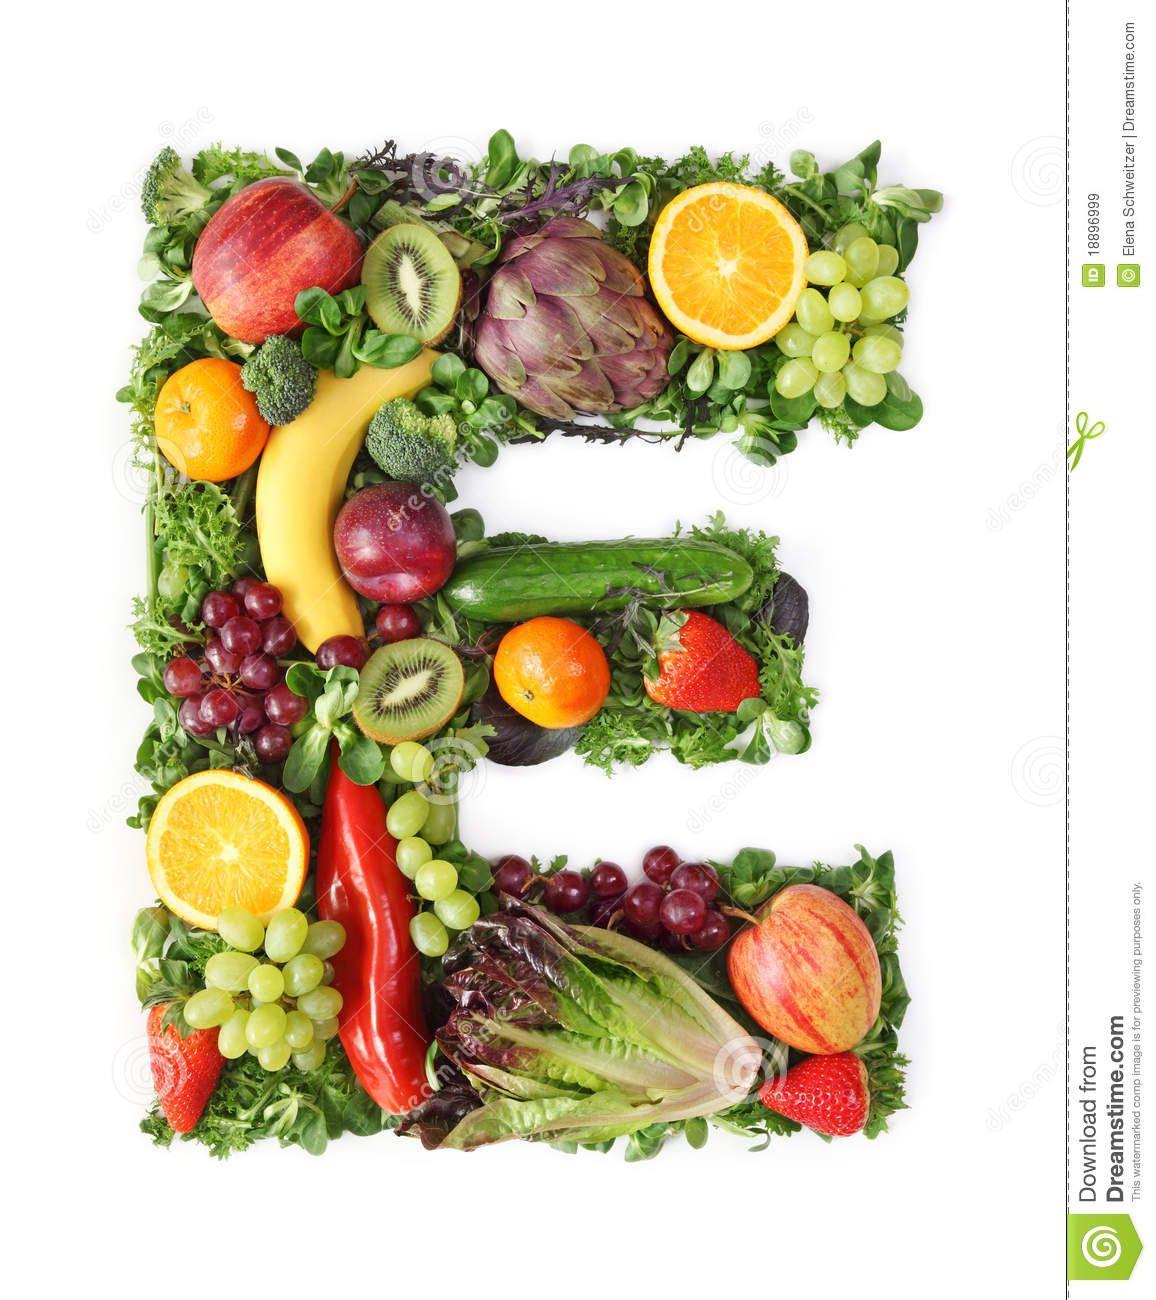 Pin De Mariela Obregon Em Frutas Y Verduras Drinks Receitas